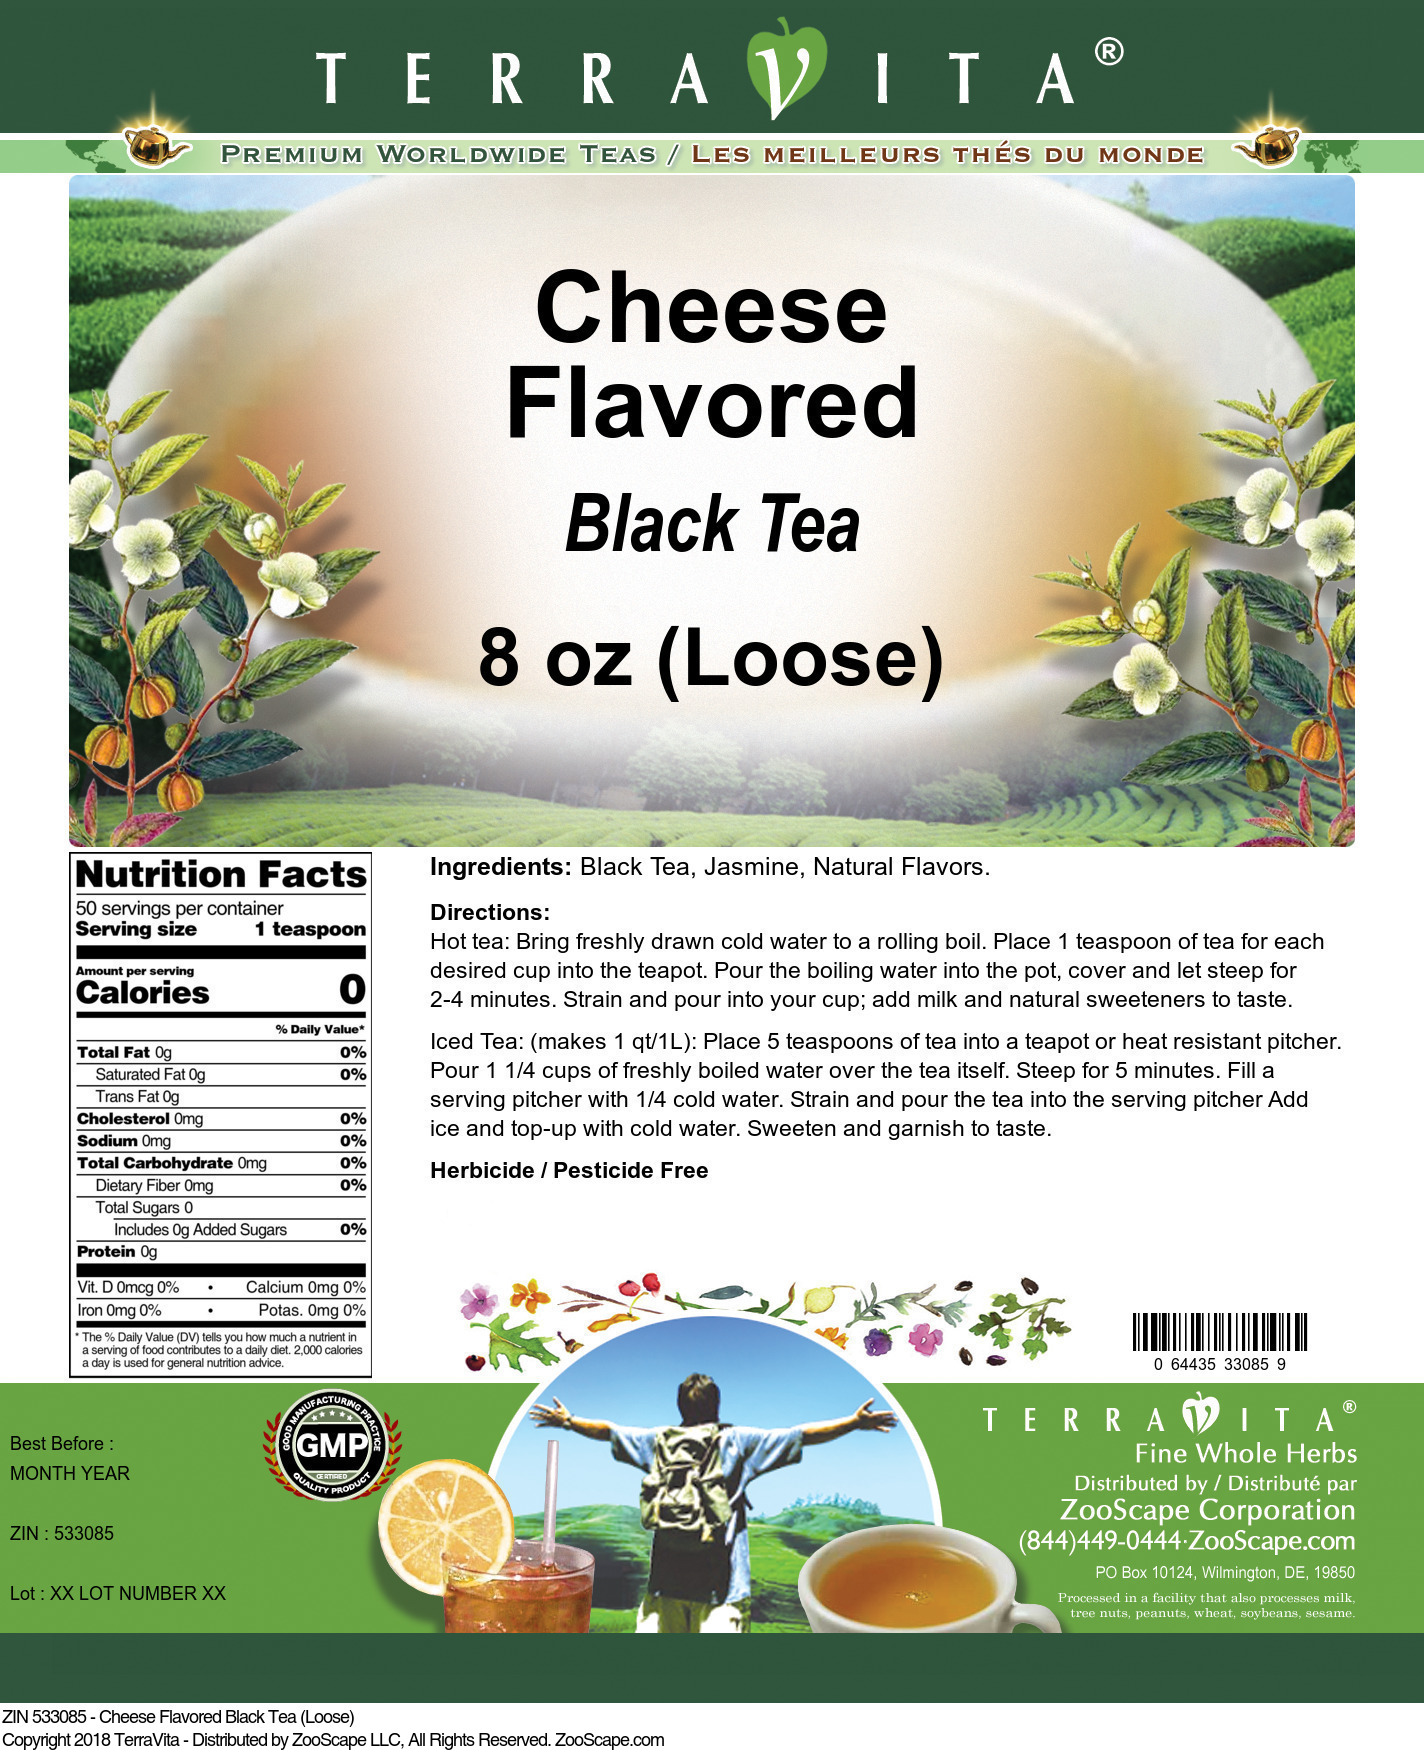 Cheese Flavored Black Tea (Loose)